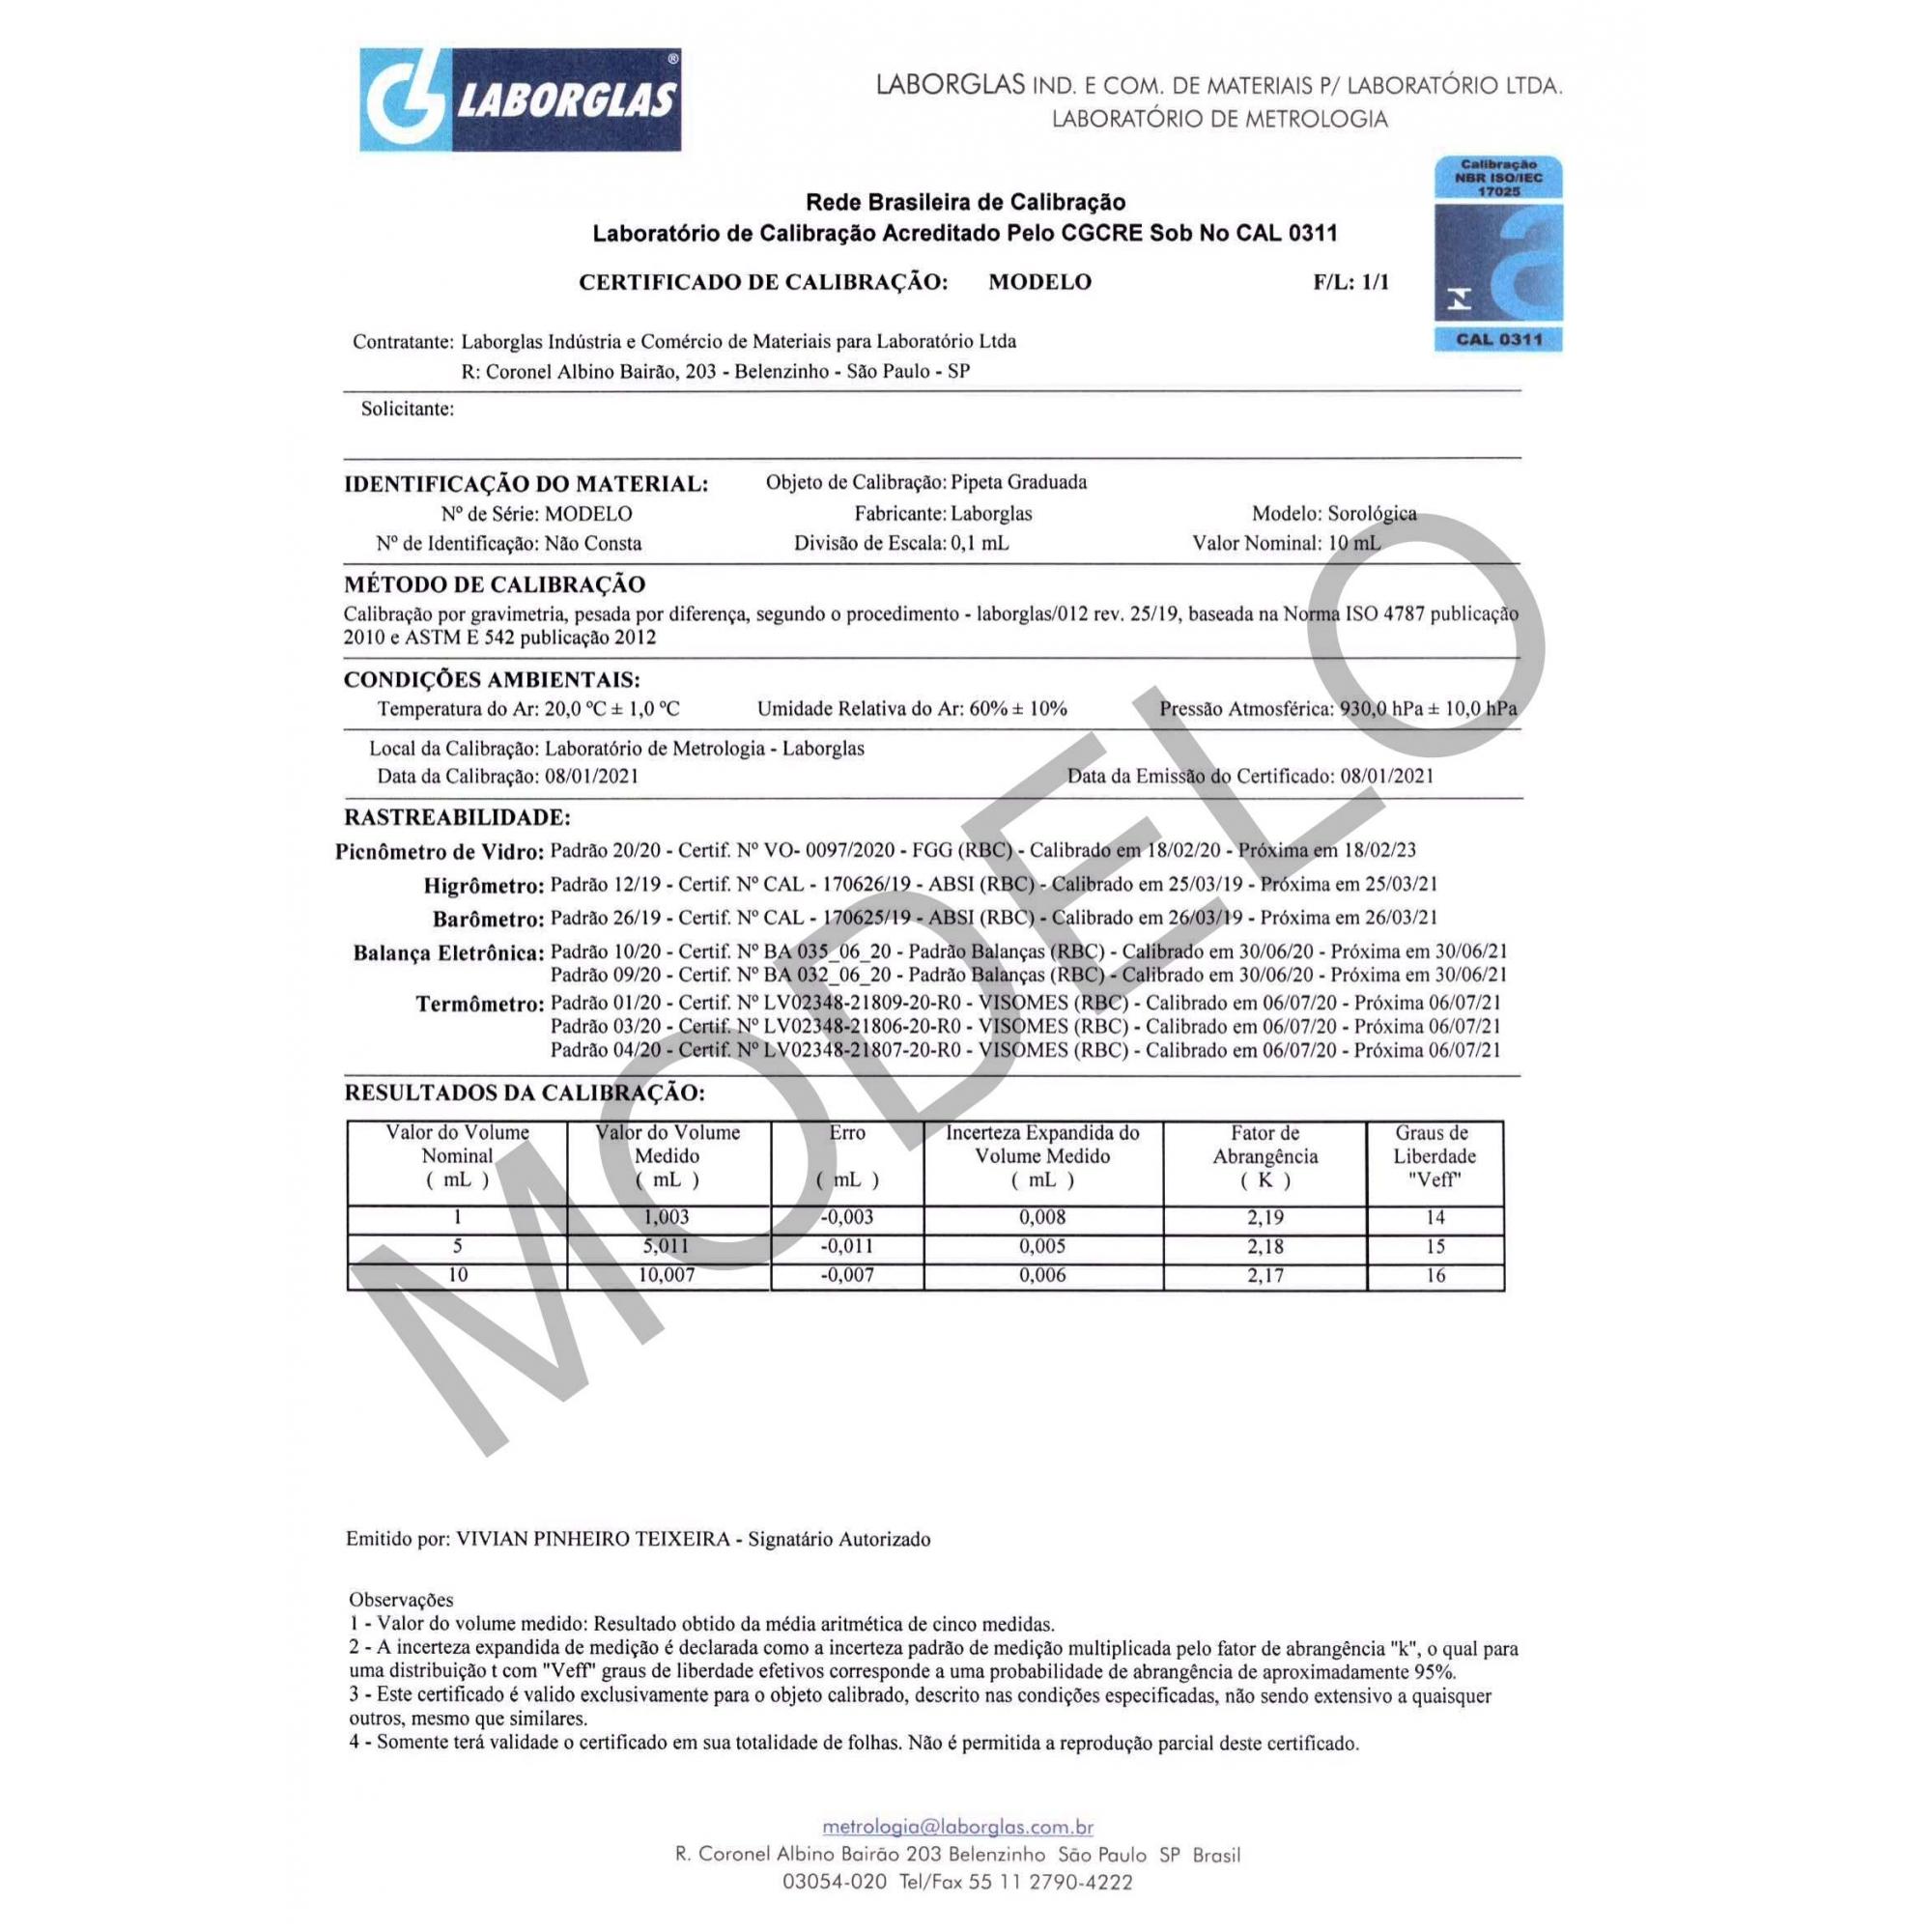 PIPETA GRAD. SOROL. ESGOT. TOTAL 0,1 ML 1/100 COM CERTIFICADO RBC - Laborglas - Cód. 9434301-R